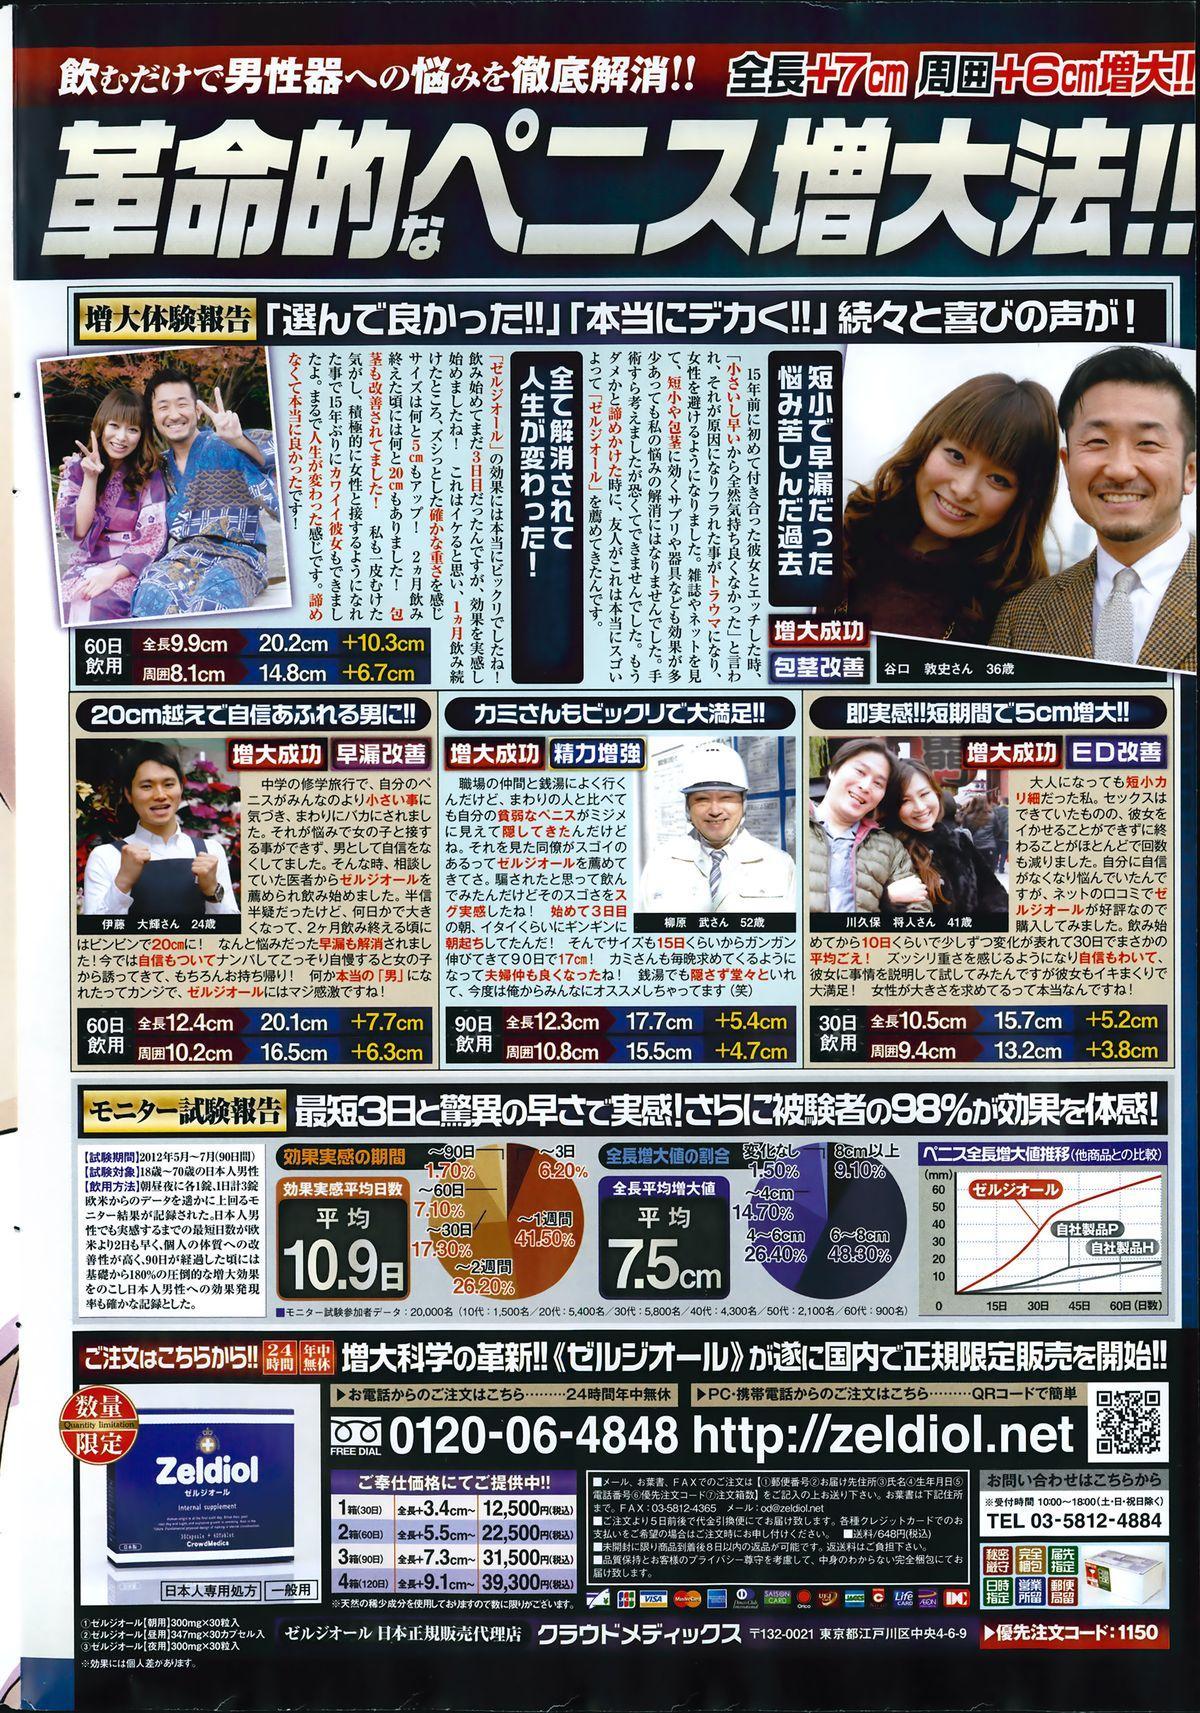 COMIC Penguin Club Sanzokuban 2014-06 239